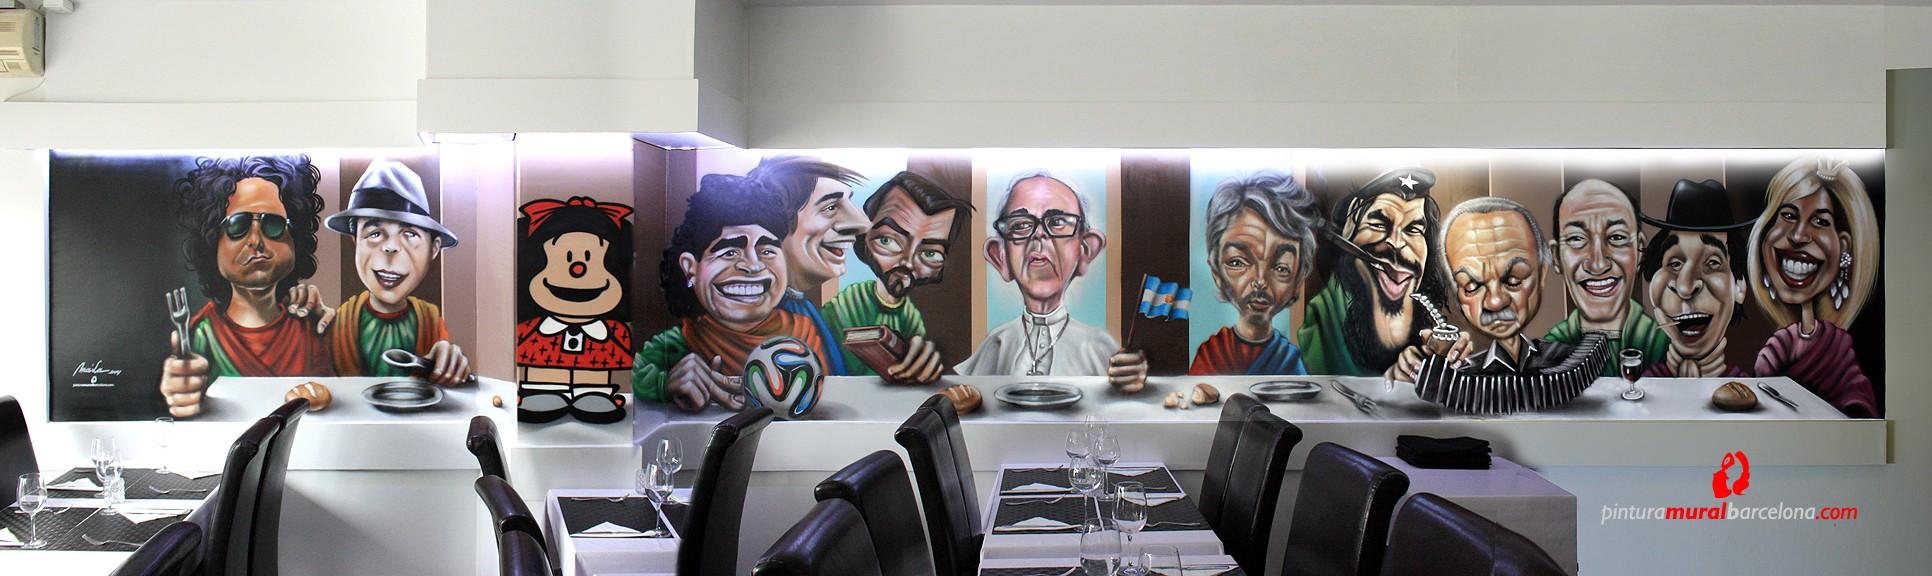 Mural graffiti con caricaturas en restaurante pintura - Pintura mural barcelona ...